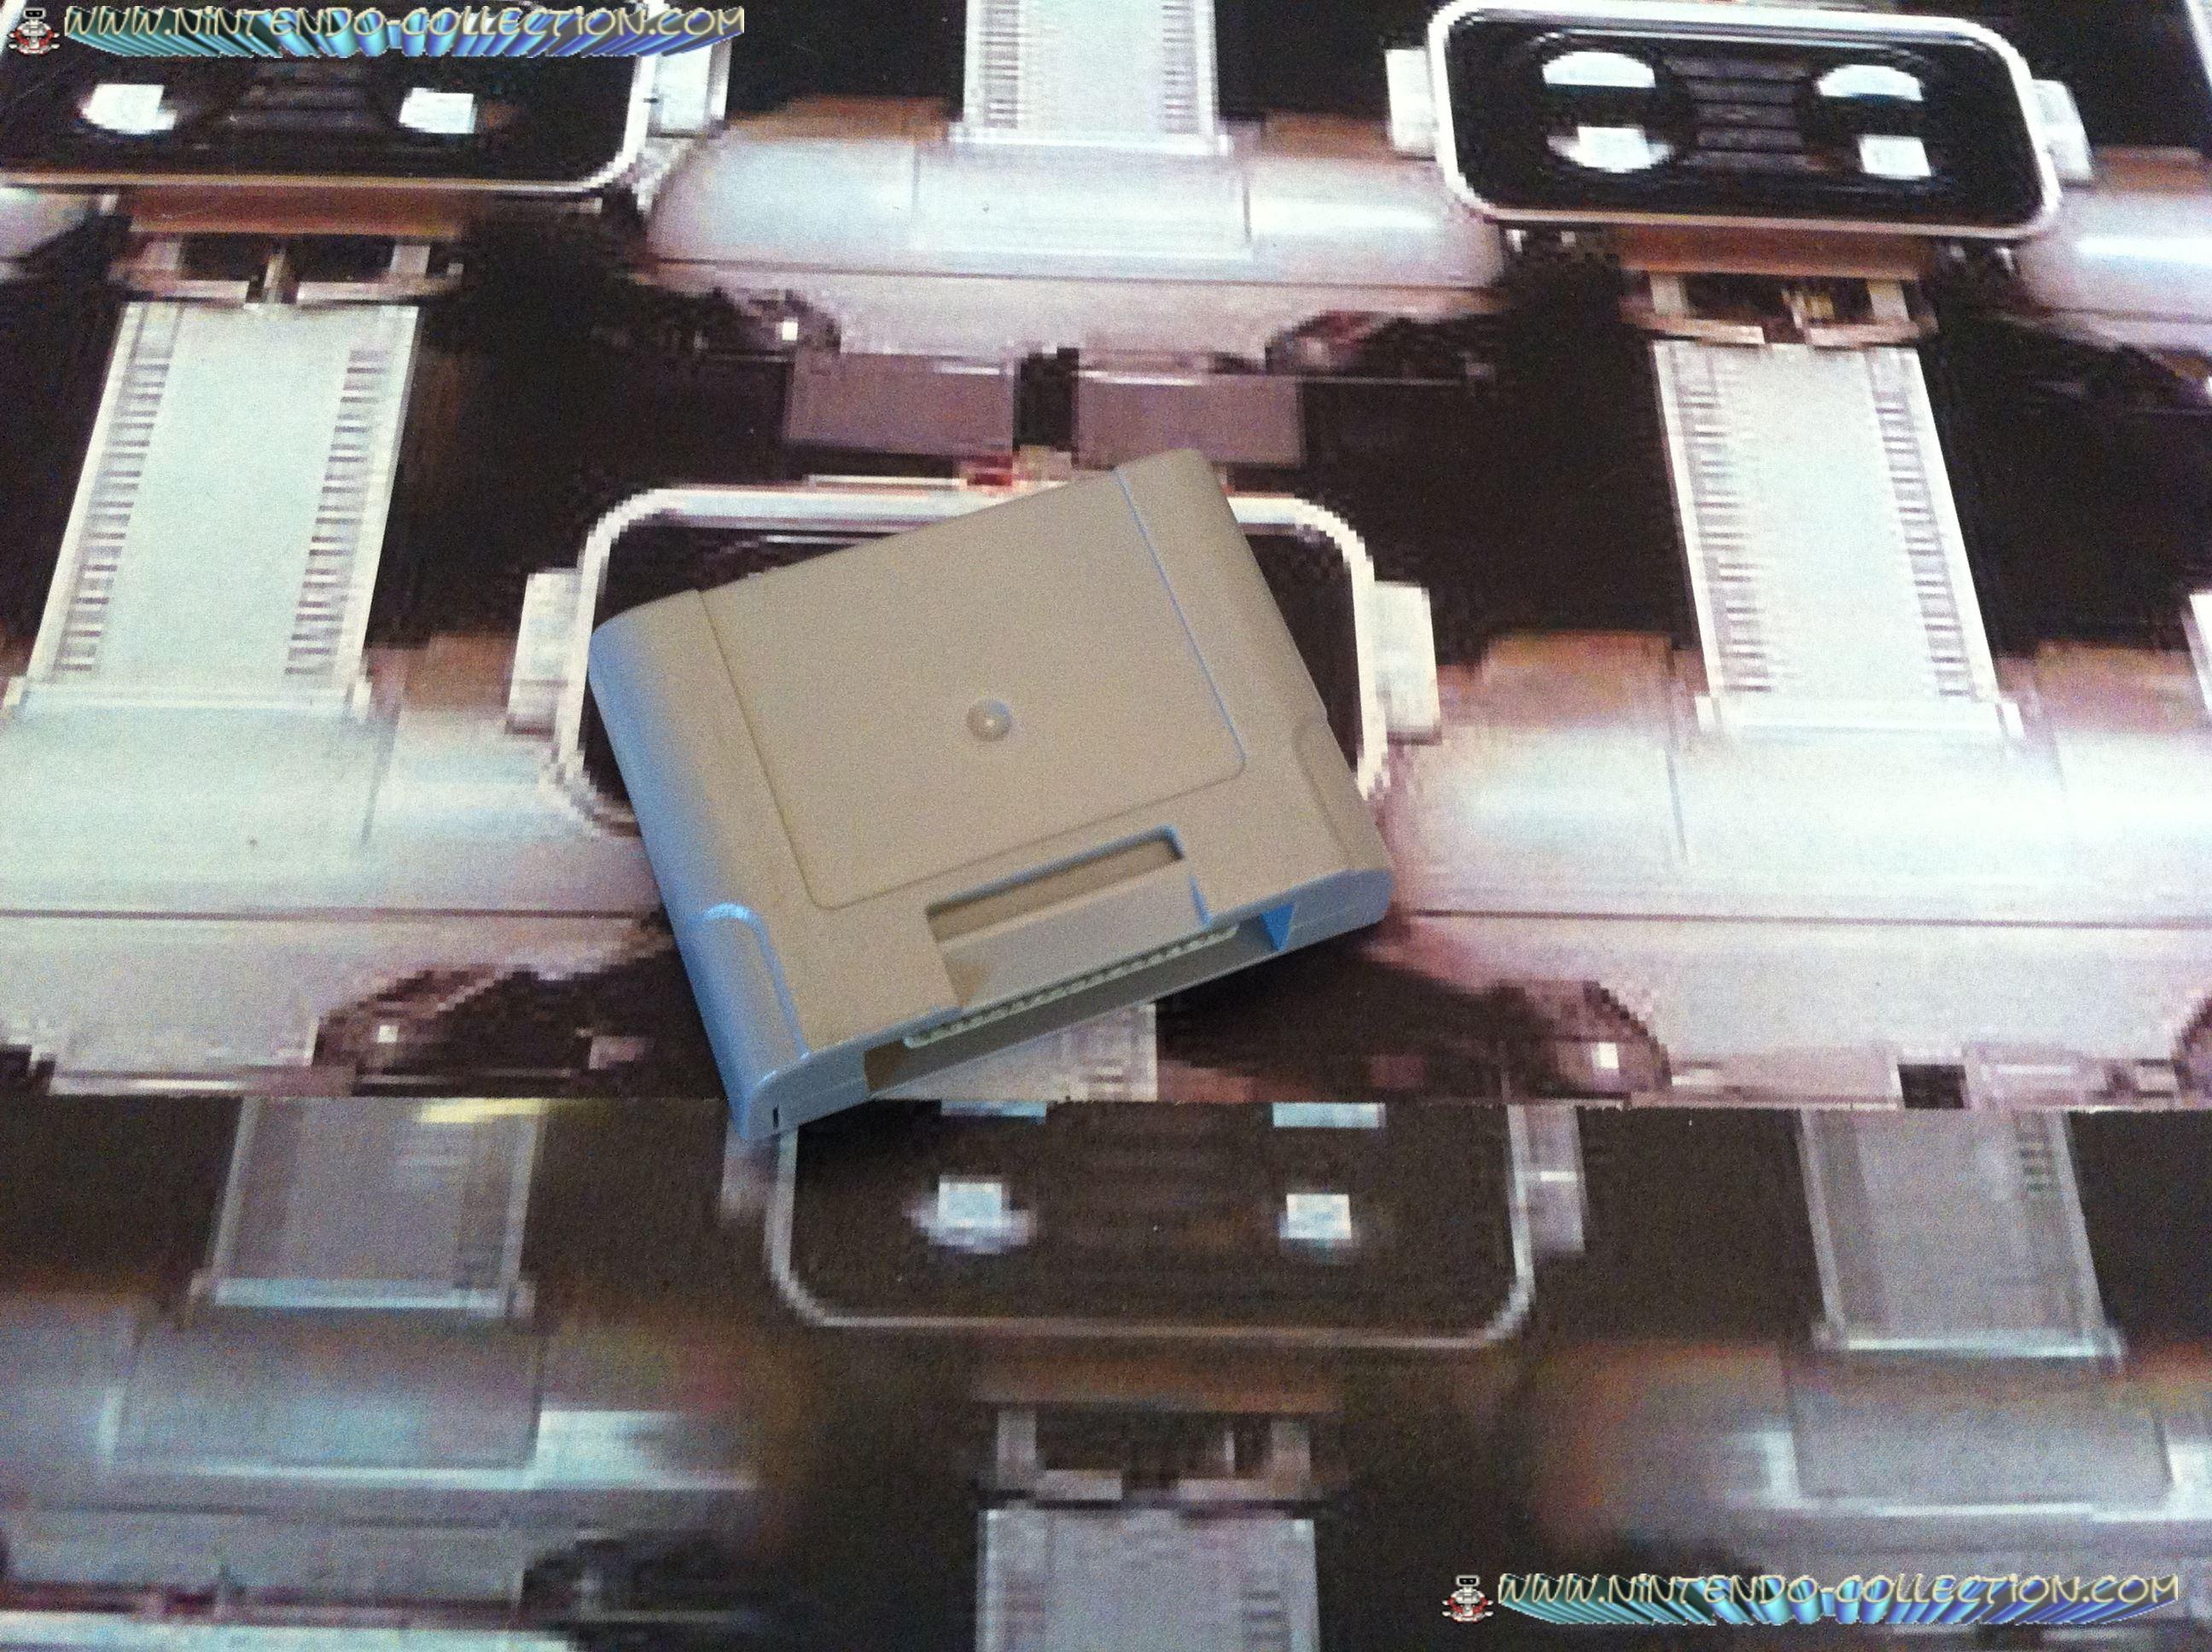 www.nintendo-collection.com - Nintendo 64 N64 Accessory - Accessoire - Memory Card - Carte Memoire -